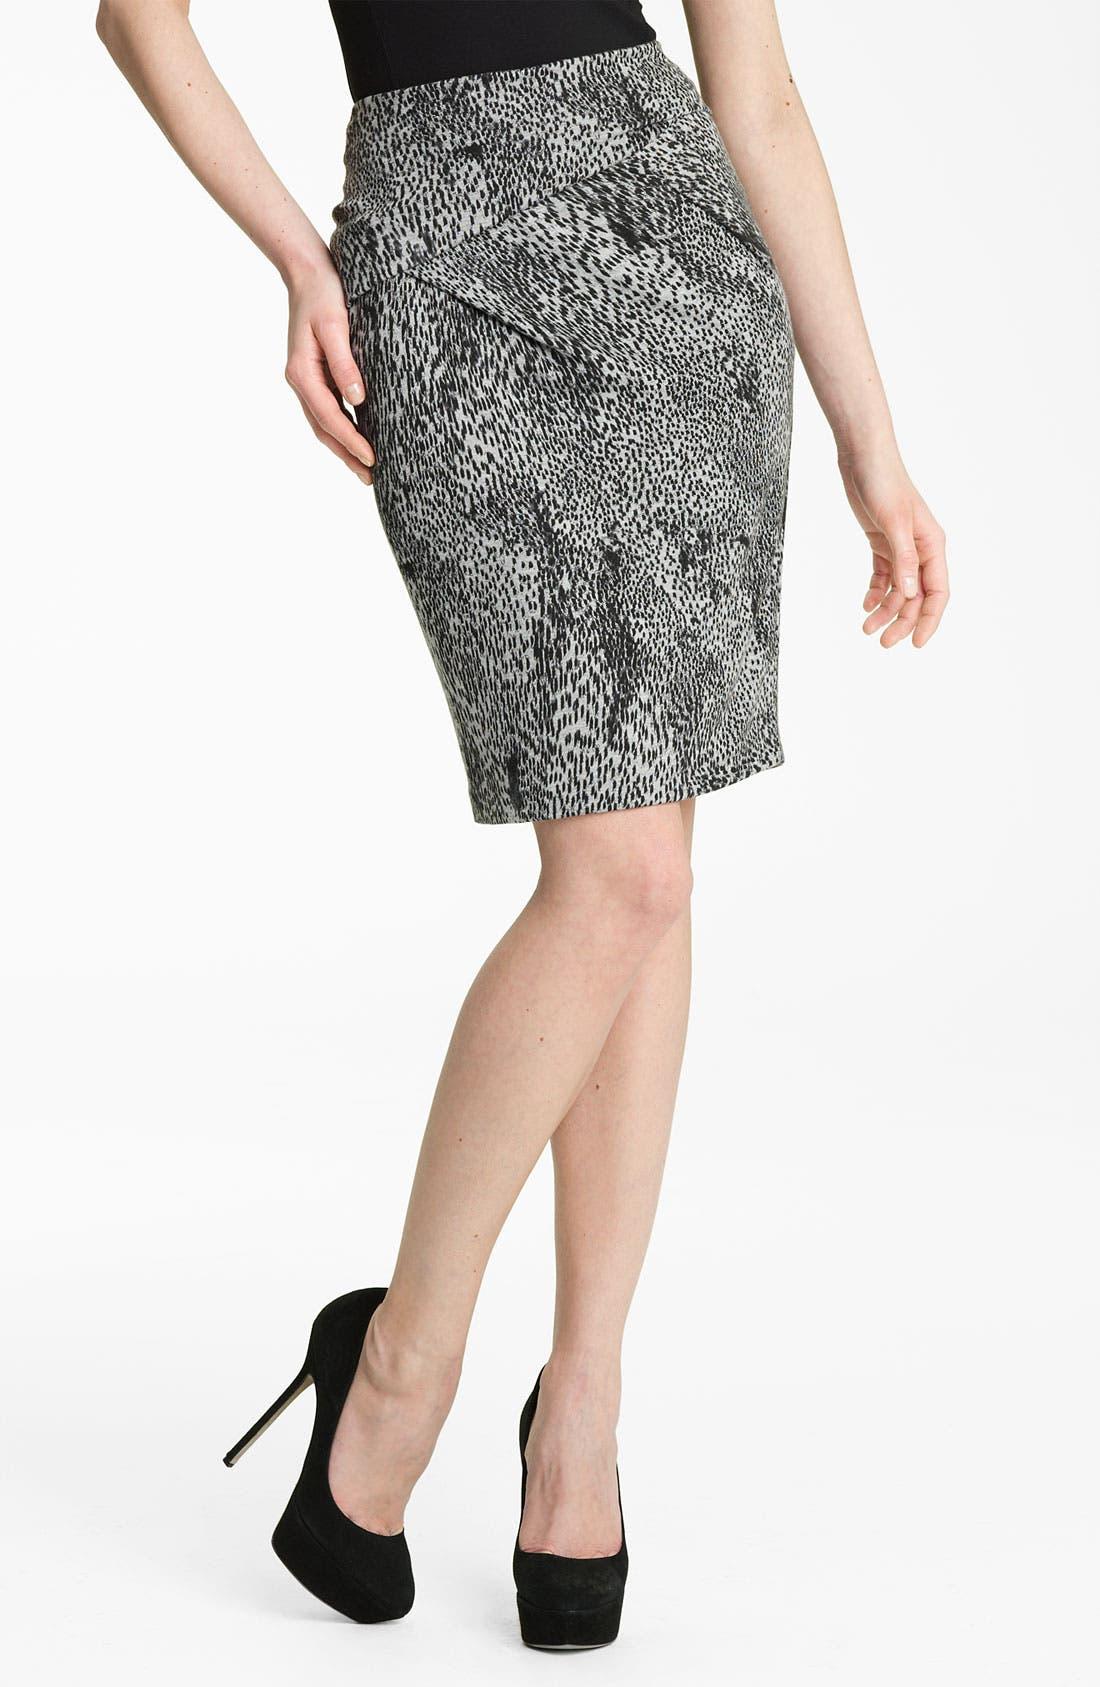 Main Image - Max Mara 'Vertigo' Print Jersey Skirt